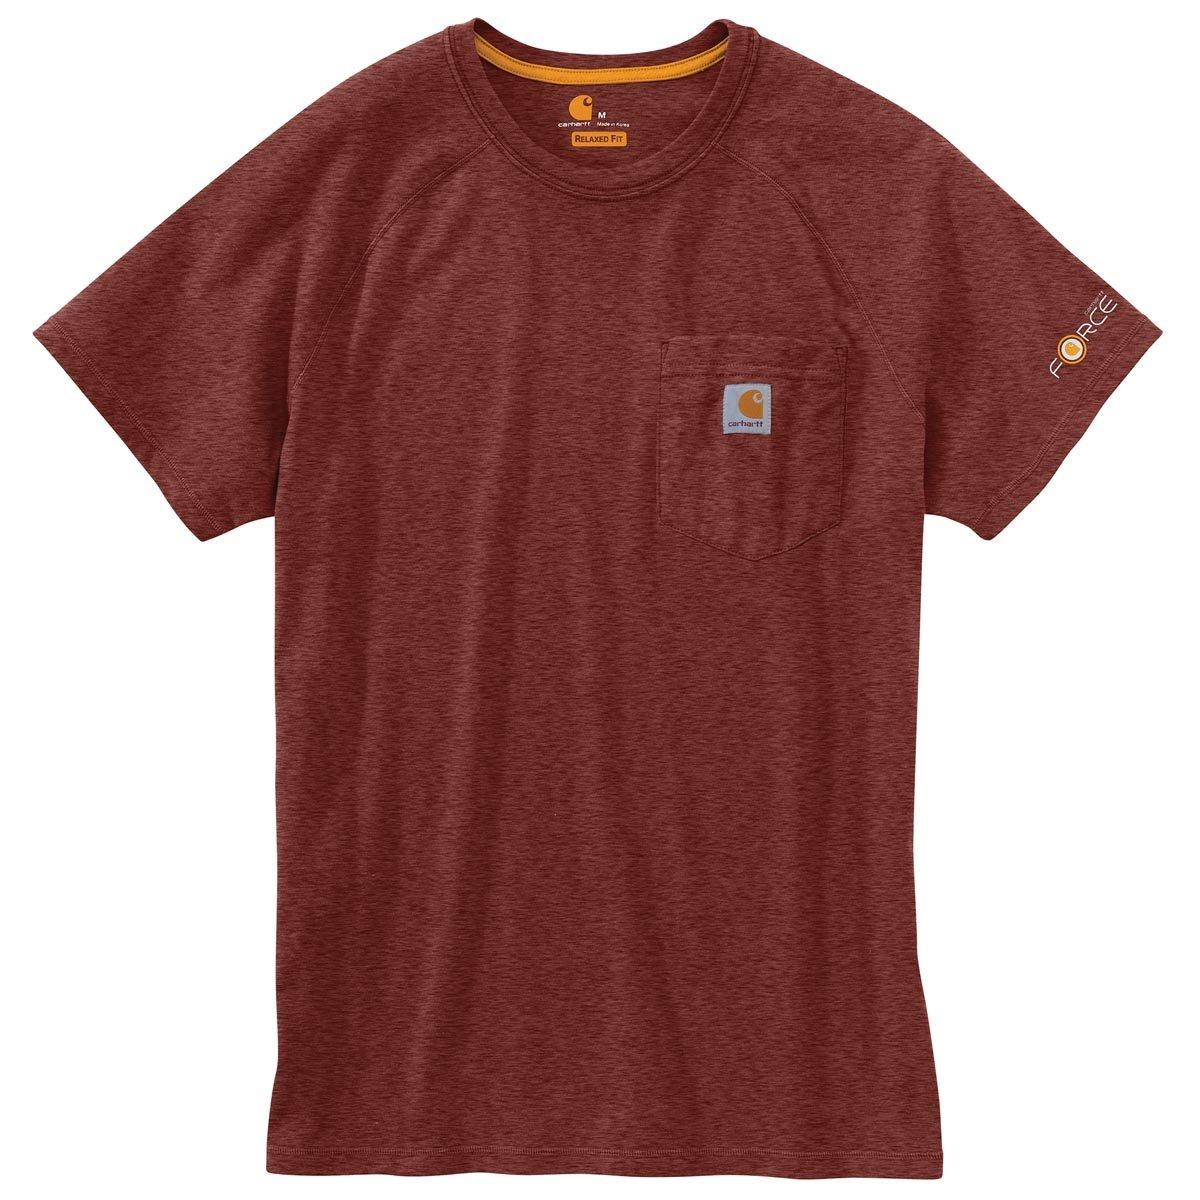 Carhartt Men's 100410 Force Short Sleeve Pocket T-Shirt - XX-Large - Sable Heather